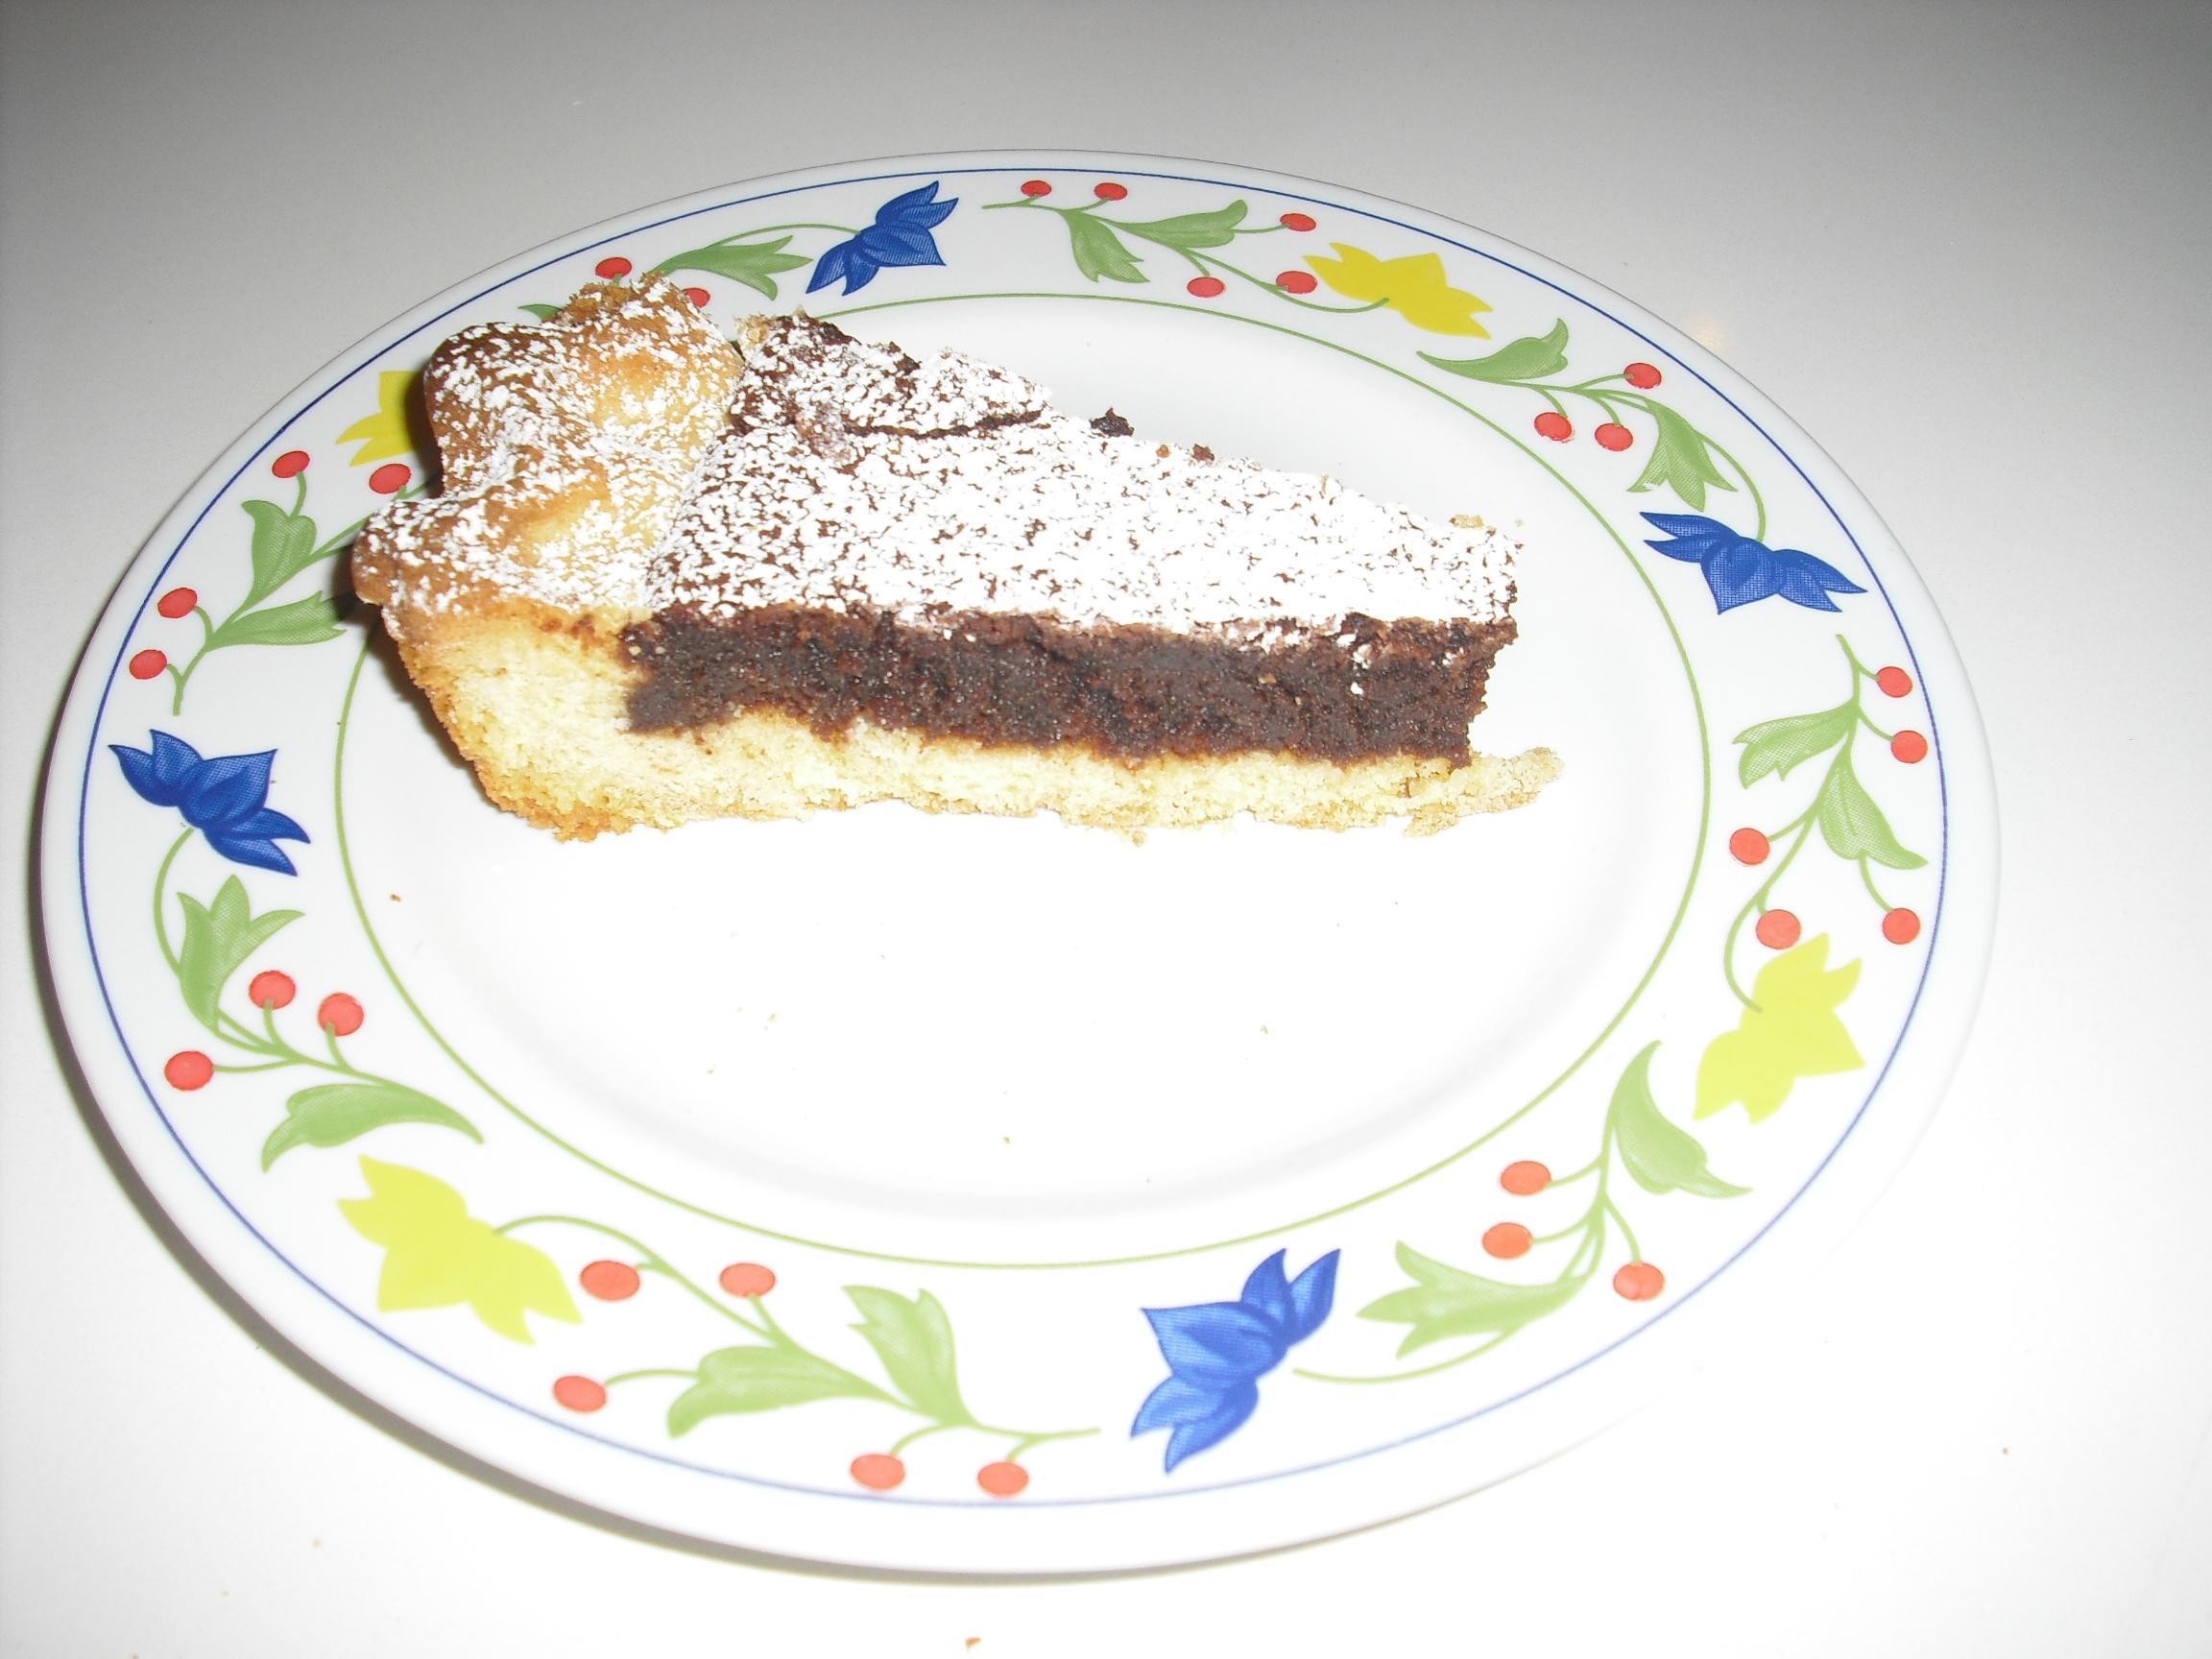 Torta Barozzi (crostata cioccolatosa!)